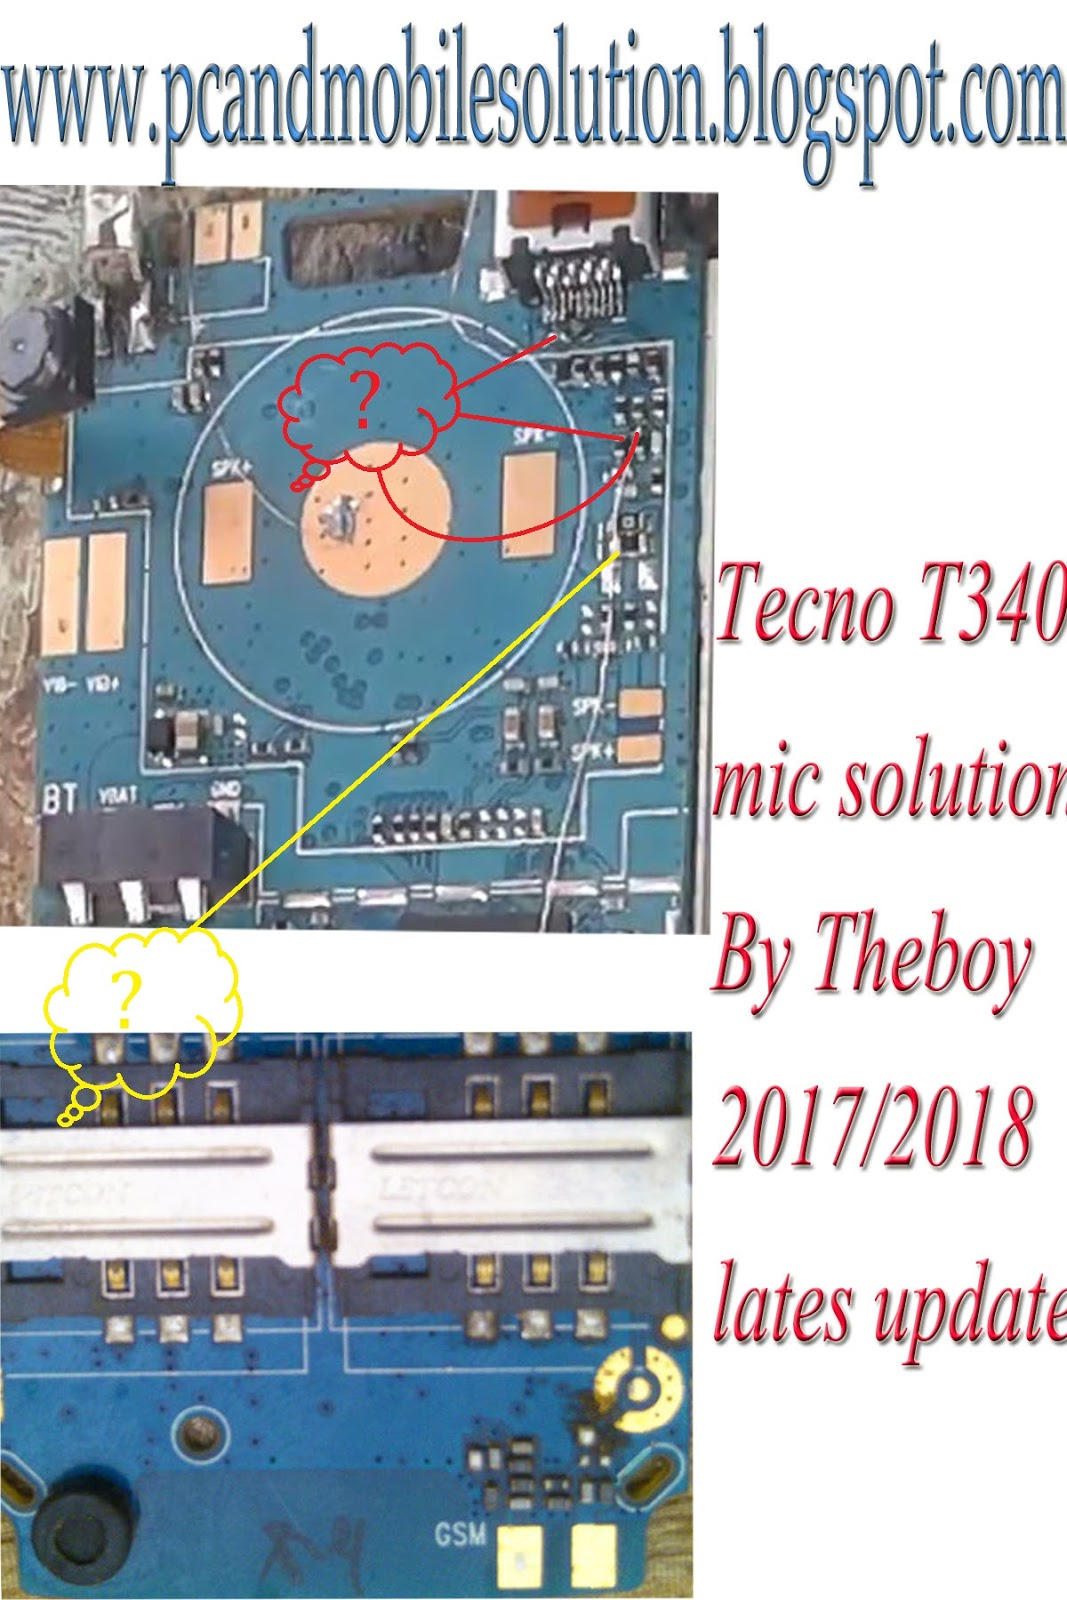 TECNO T340 MIC JUMPER NO CPU CHANGE - Jumare's blog